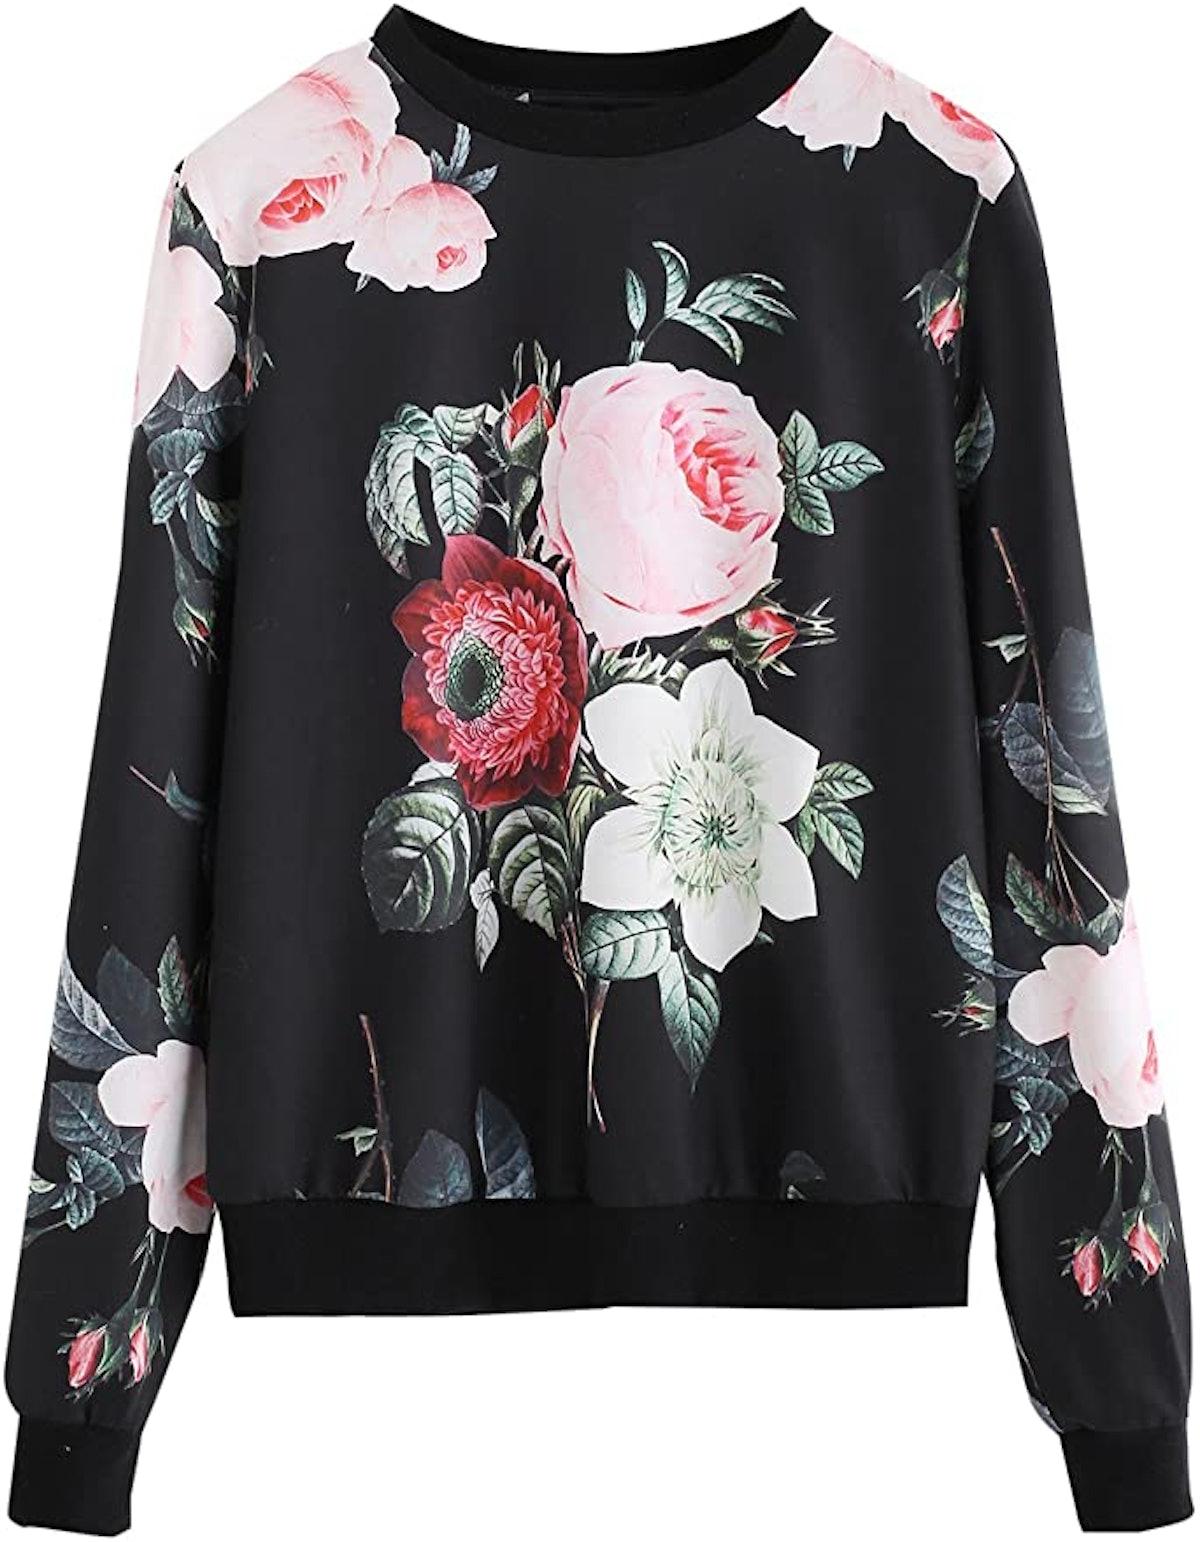 Romwe Lightweight Sweatshirt